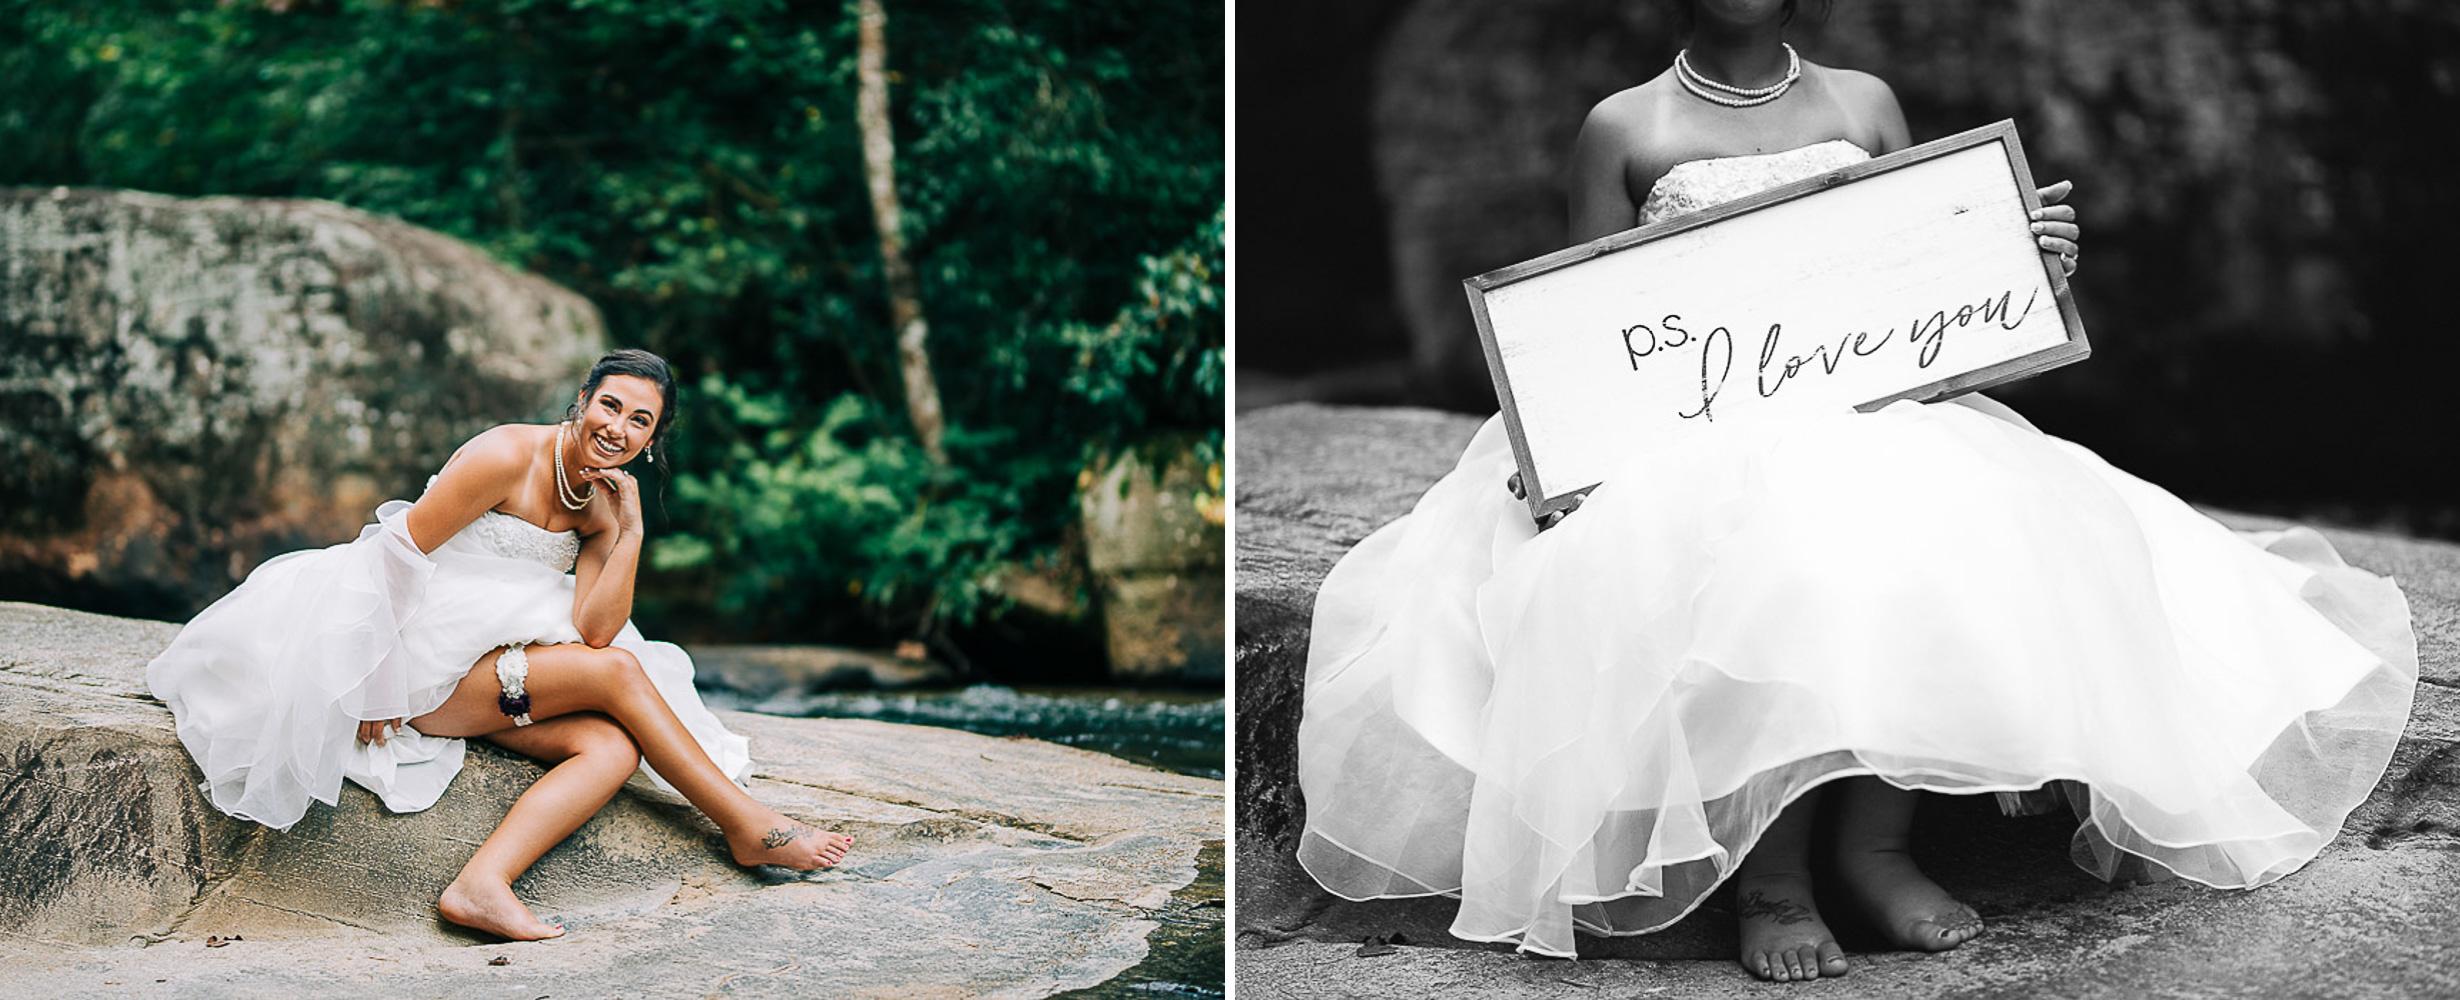 River Bridal Portraits, South Carolina Wedding Photographer, 14.jpg